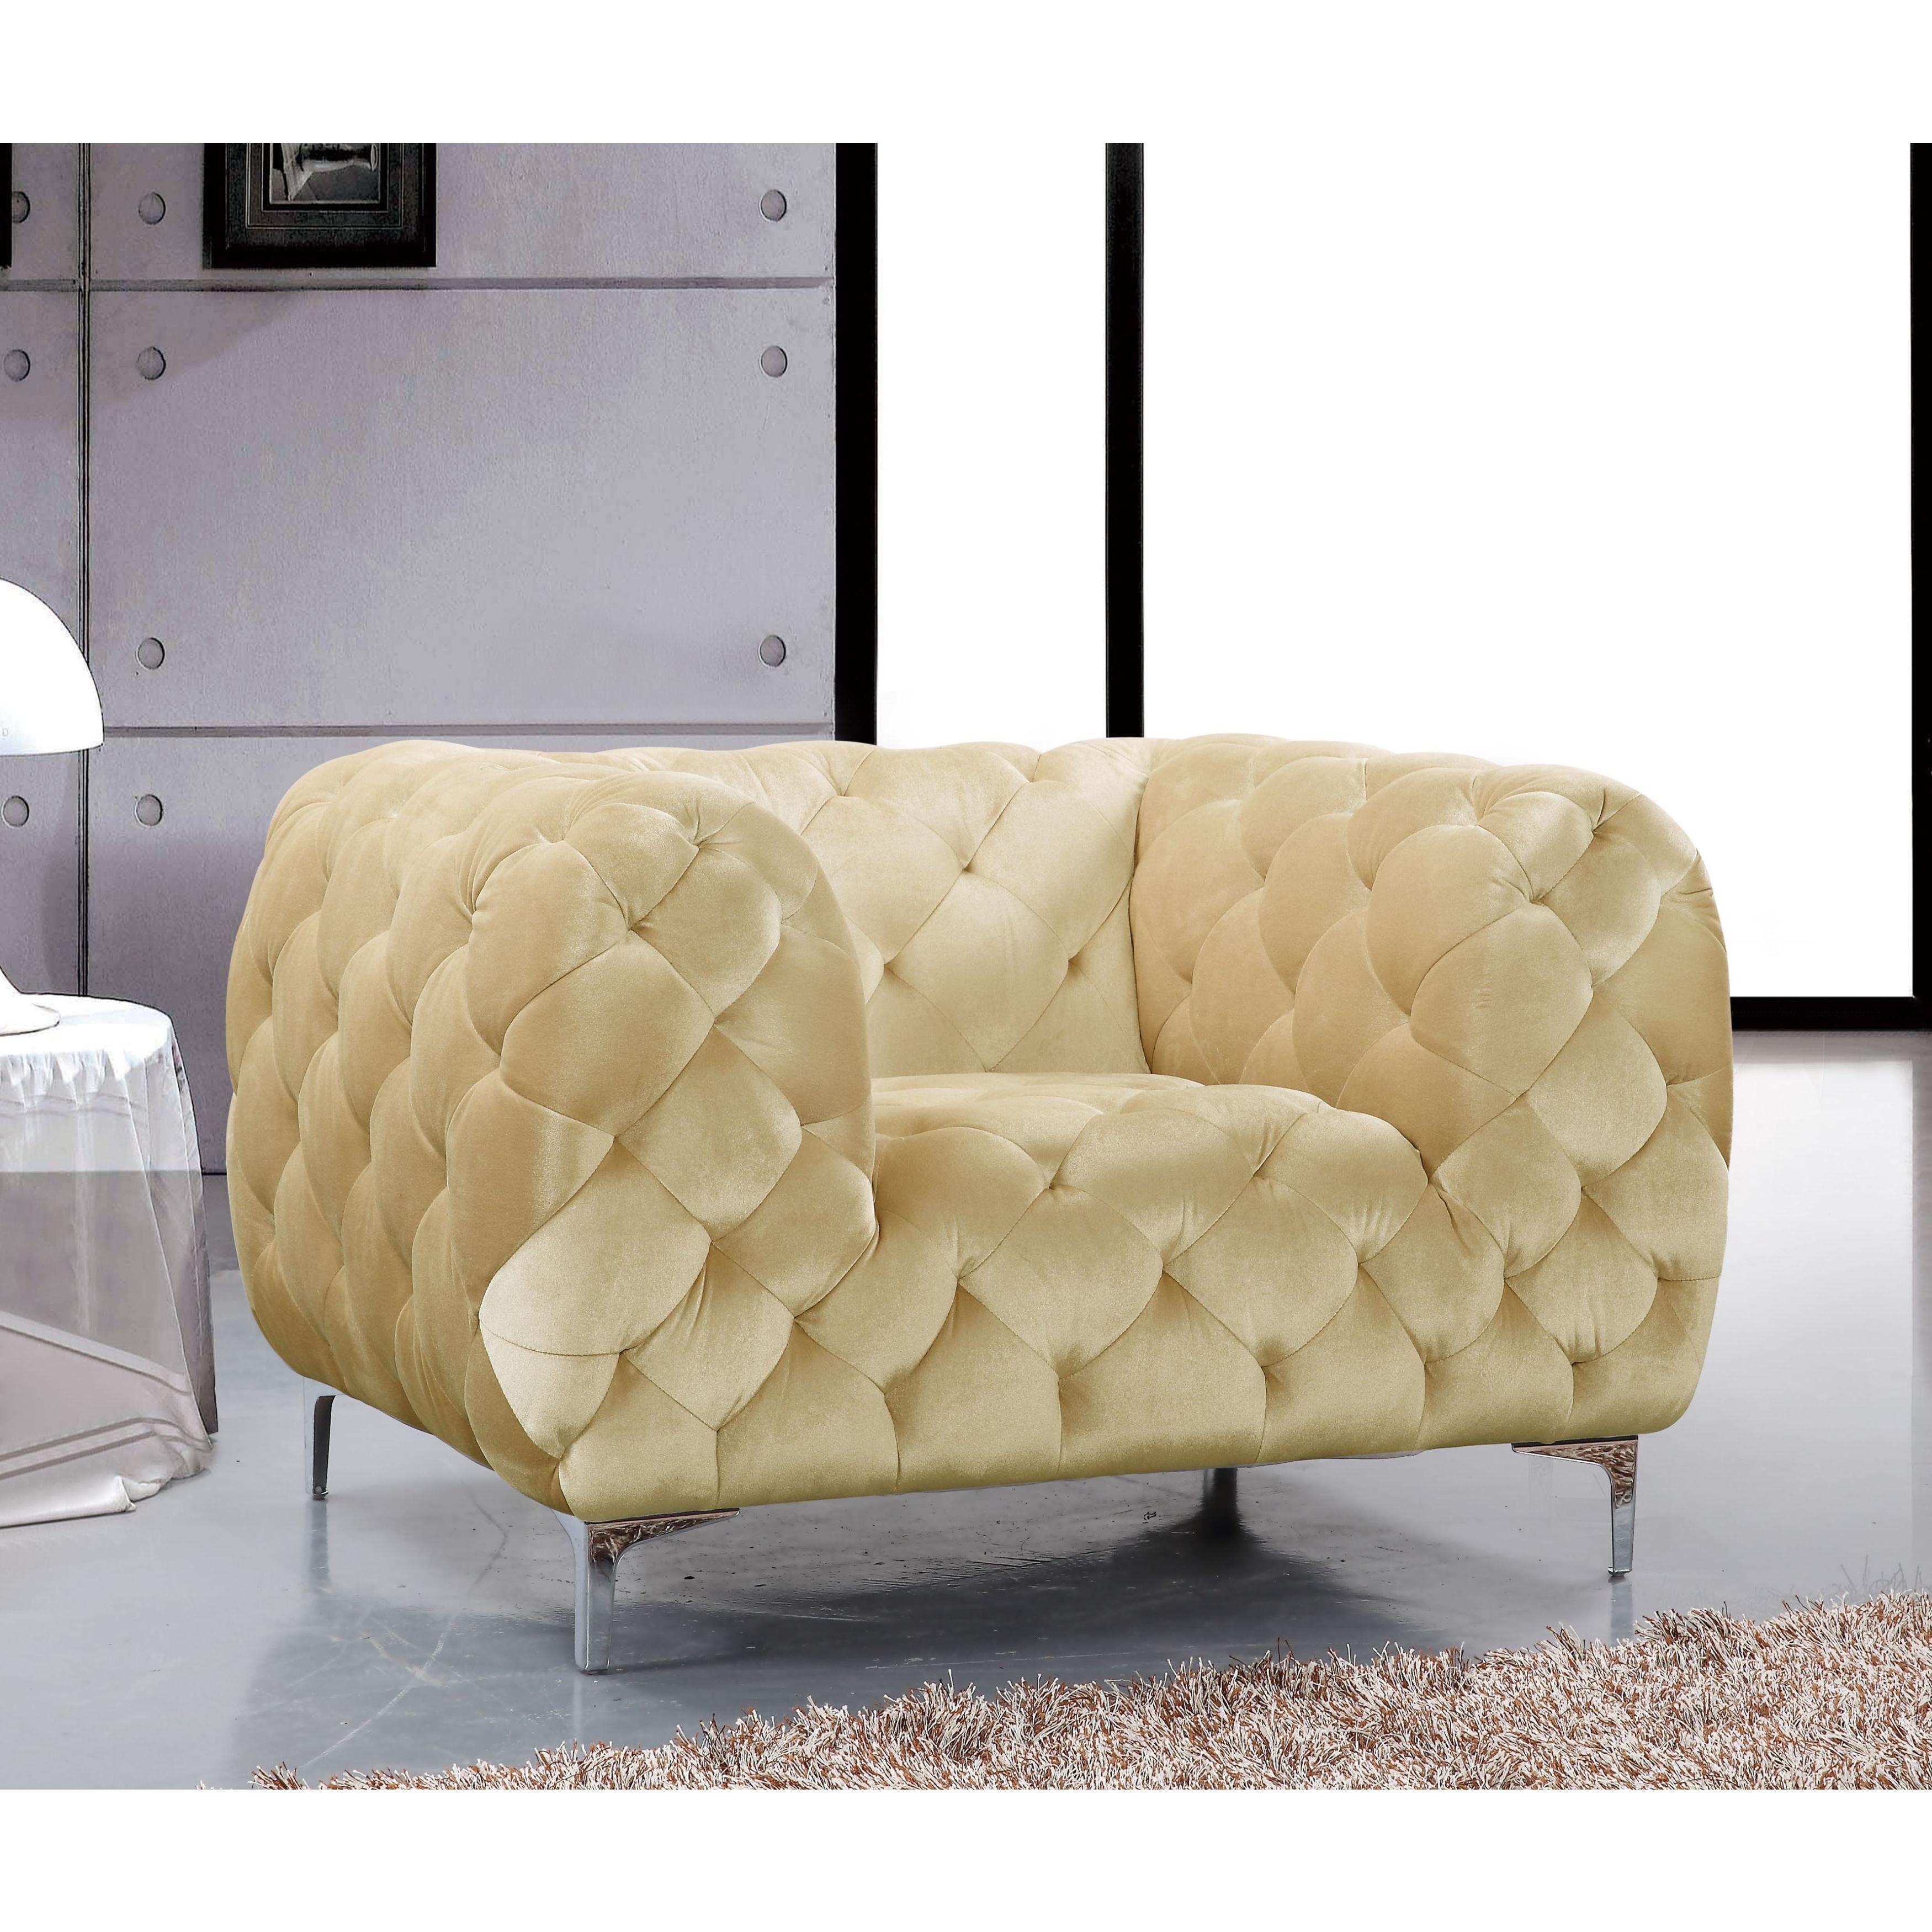 Preferred Shop Meridian Mercer Beige Velvet Tufted Chair – Free Shipping Today For Mercer Foam Oversized Sofa Chairs (View 10 of 20)